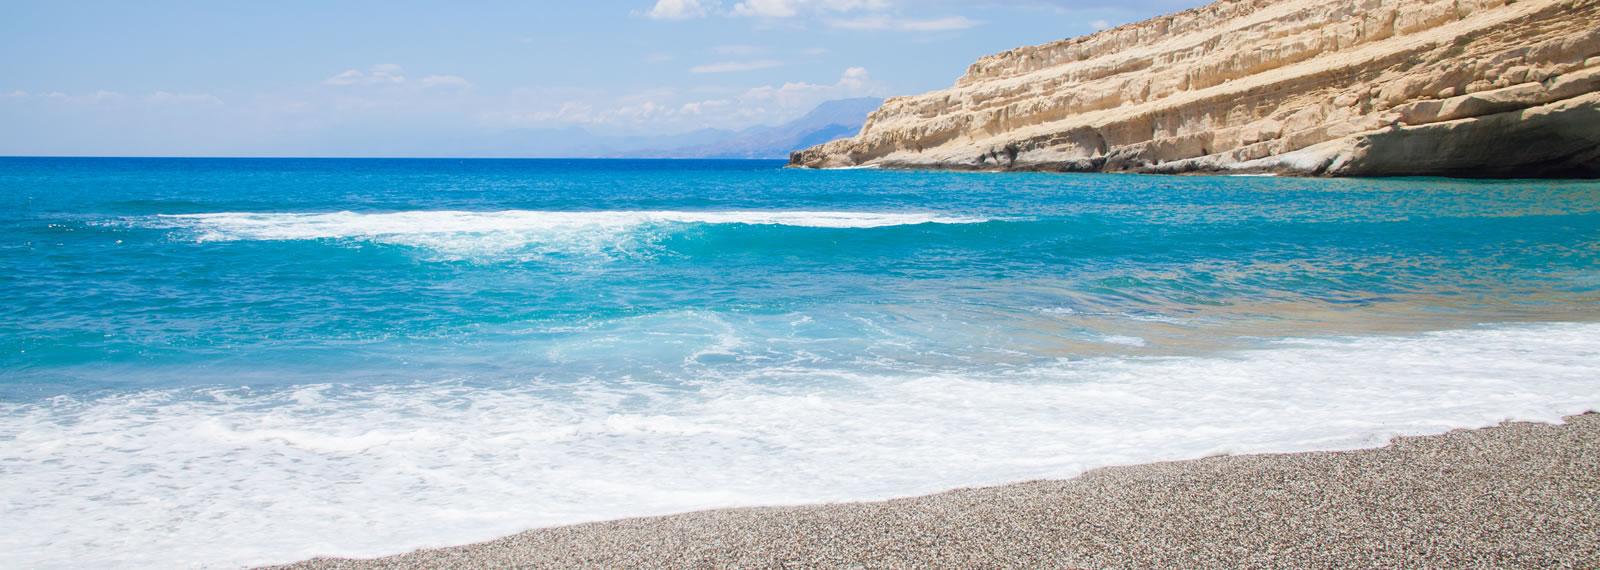 All-Inclusive Week in Crete